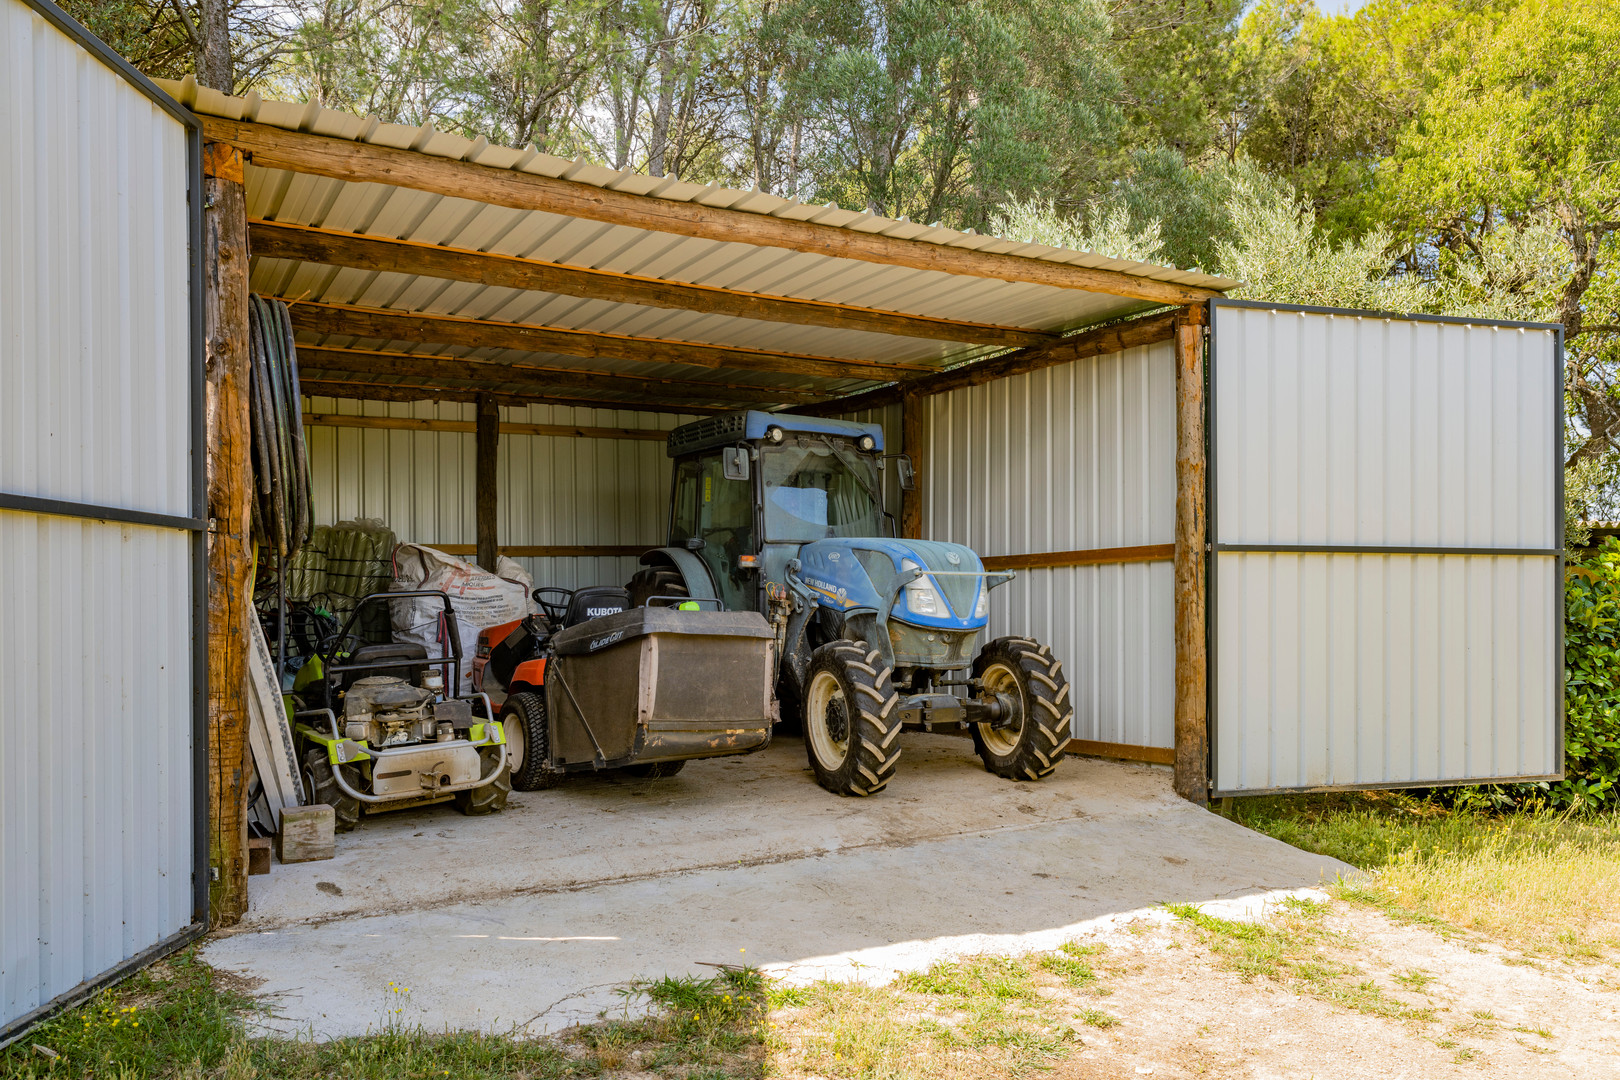 Traktor_DSC2661.jpg